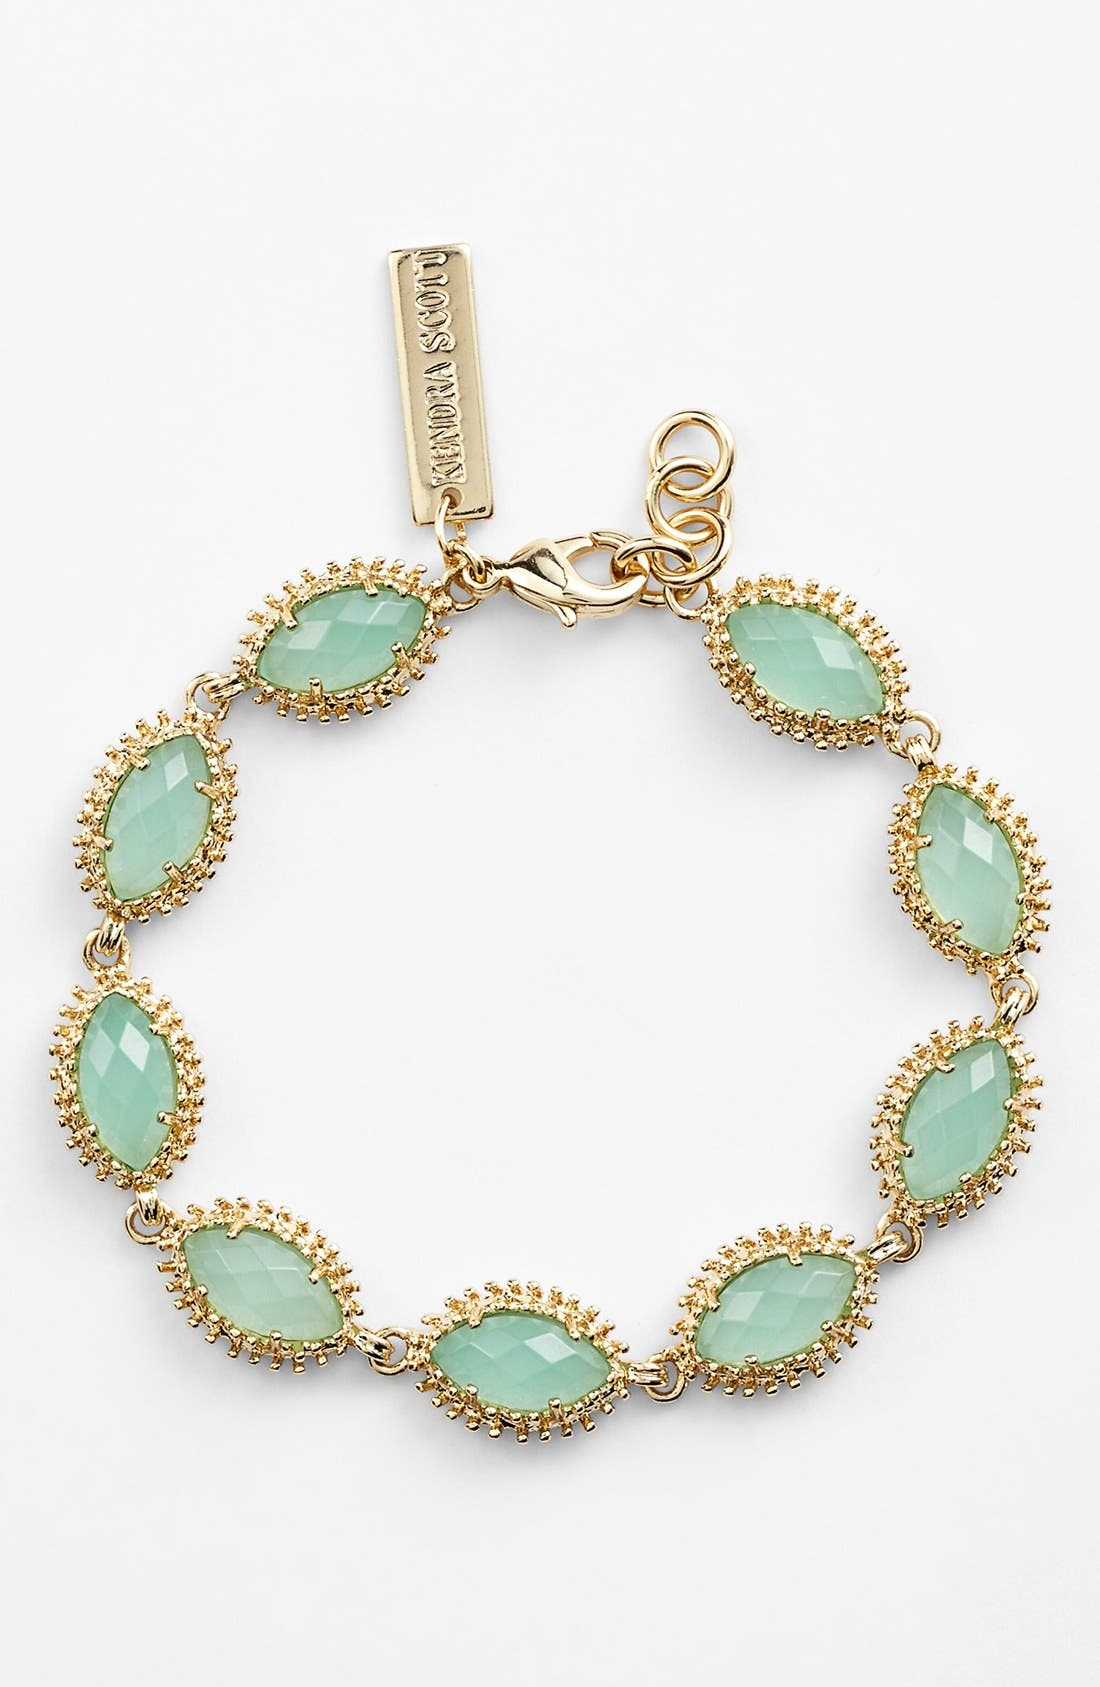 Main Image - Kendra Scott 'Jana' Line Bracelet